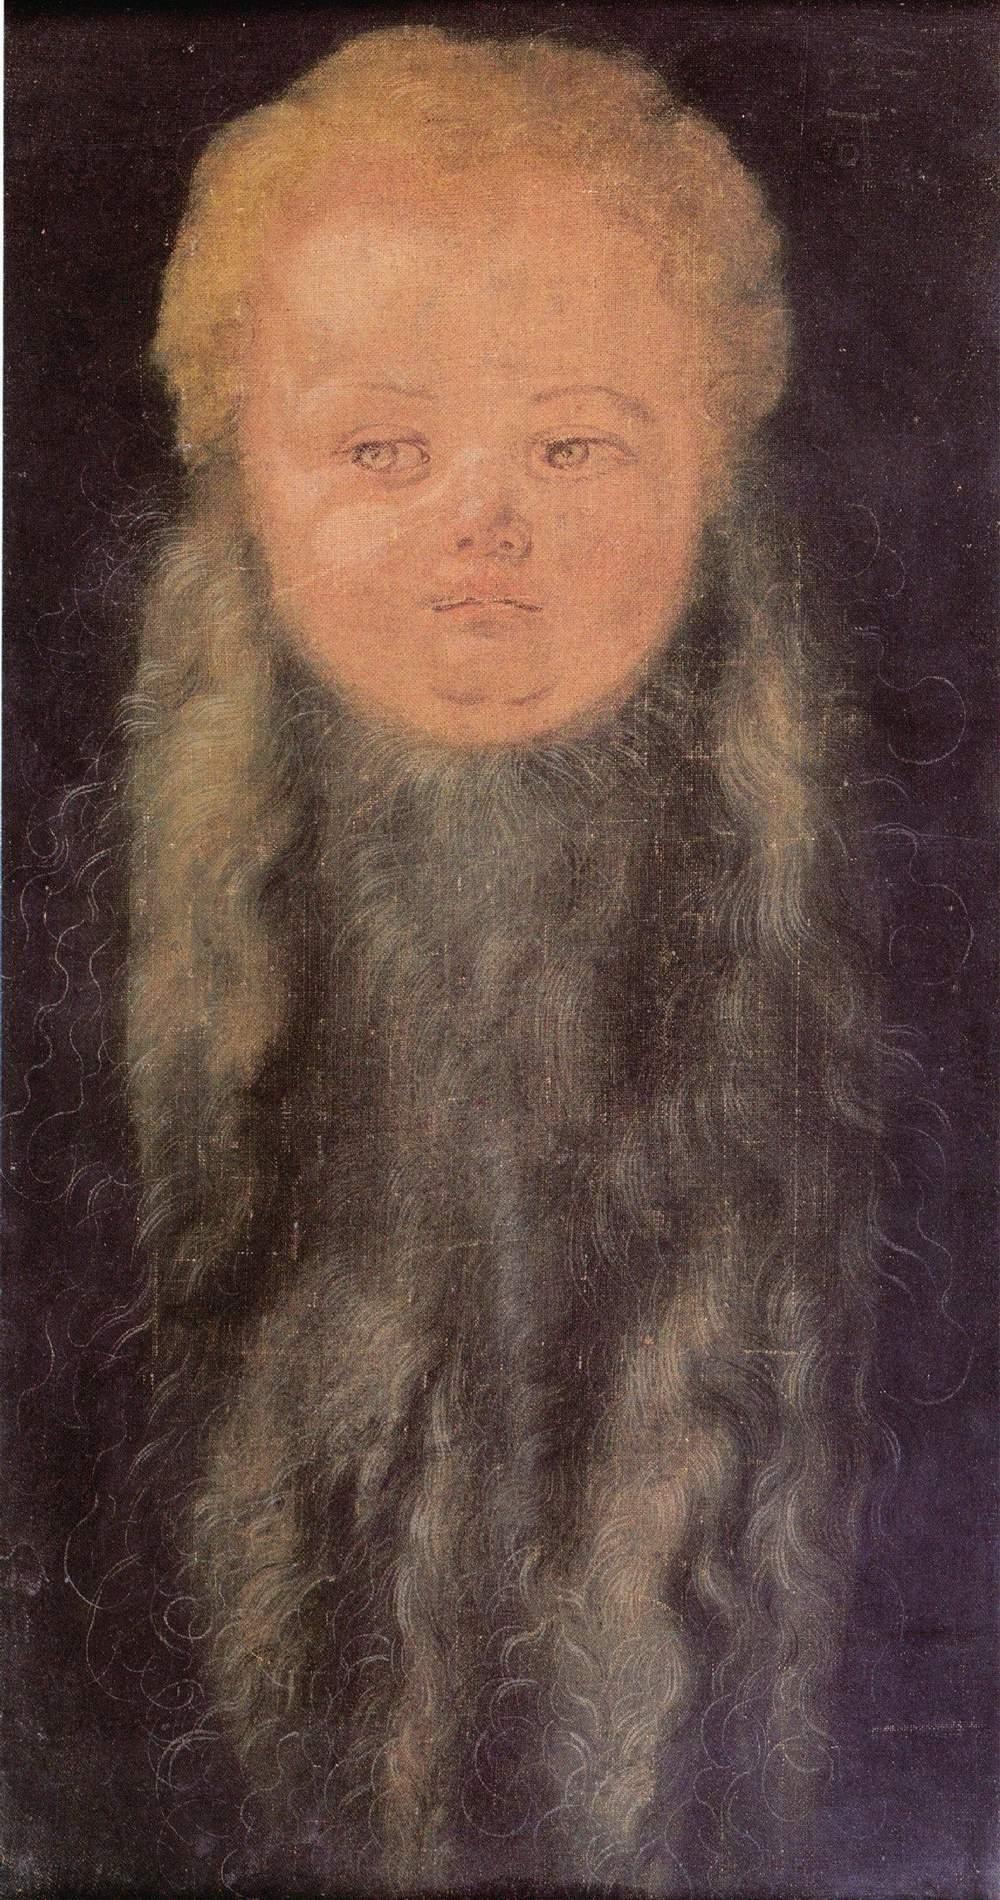 Голова бородатого младенца, Альбрехт Дюрер